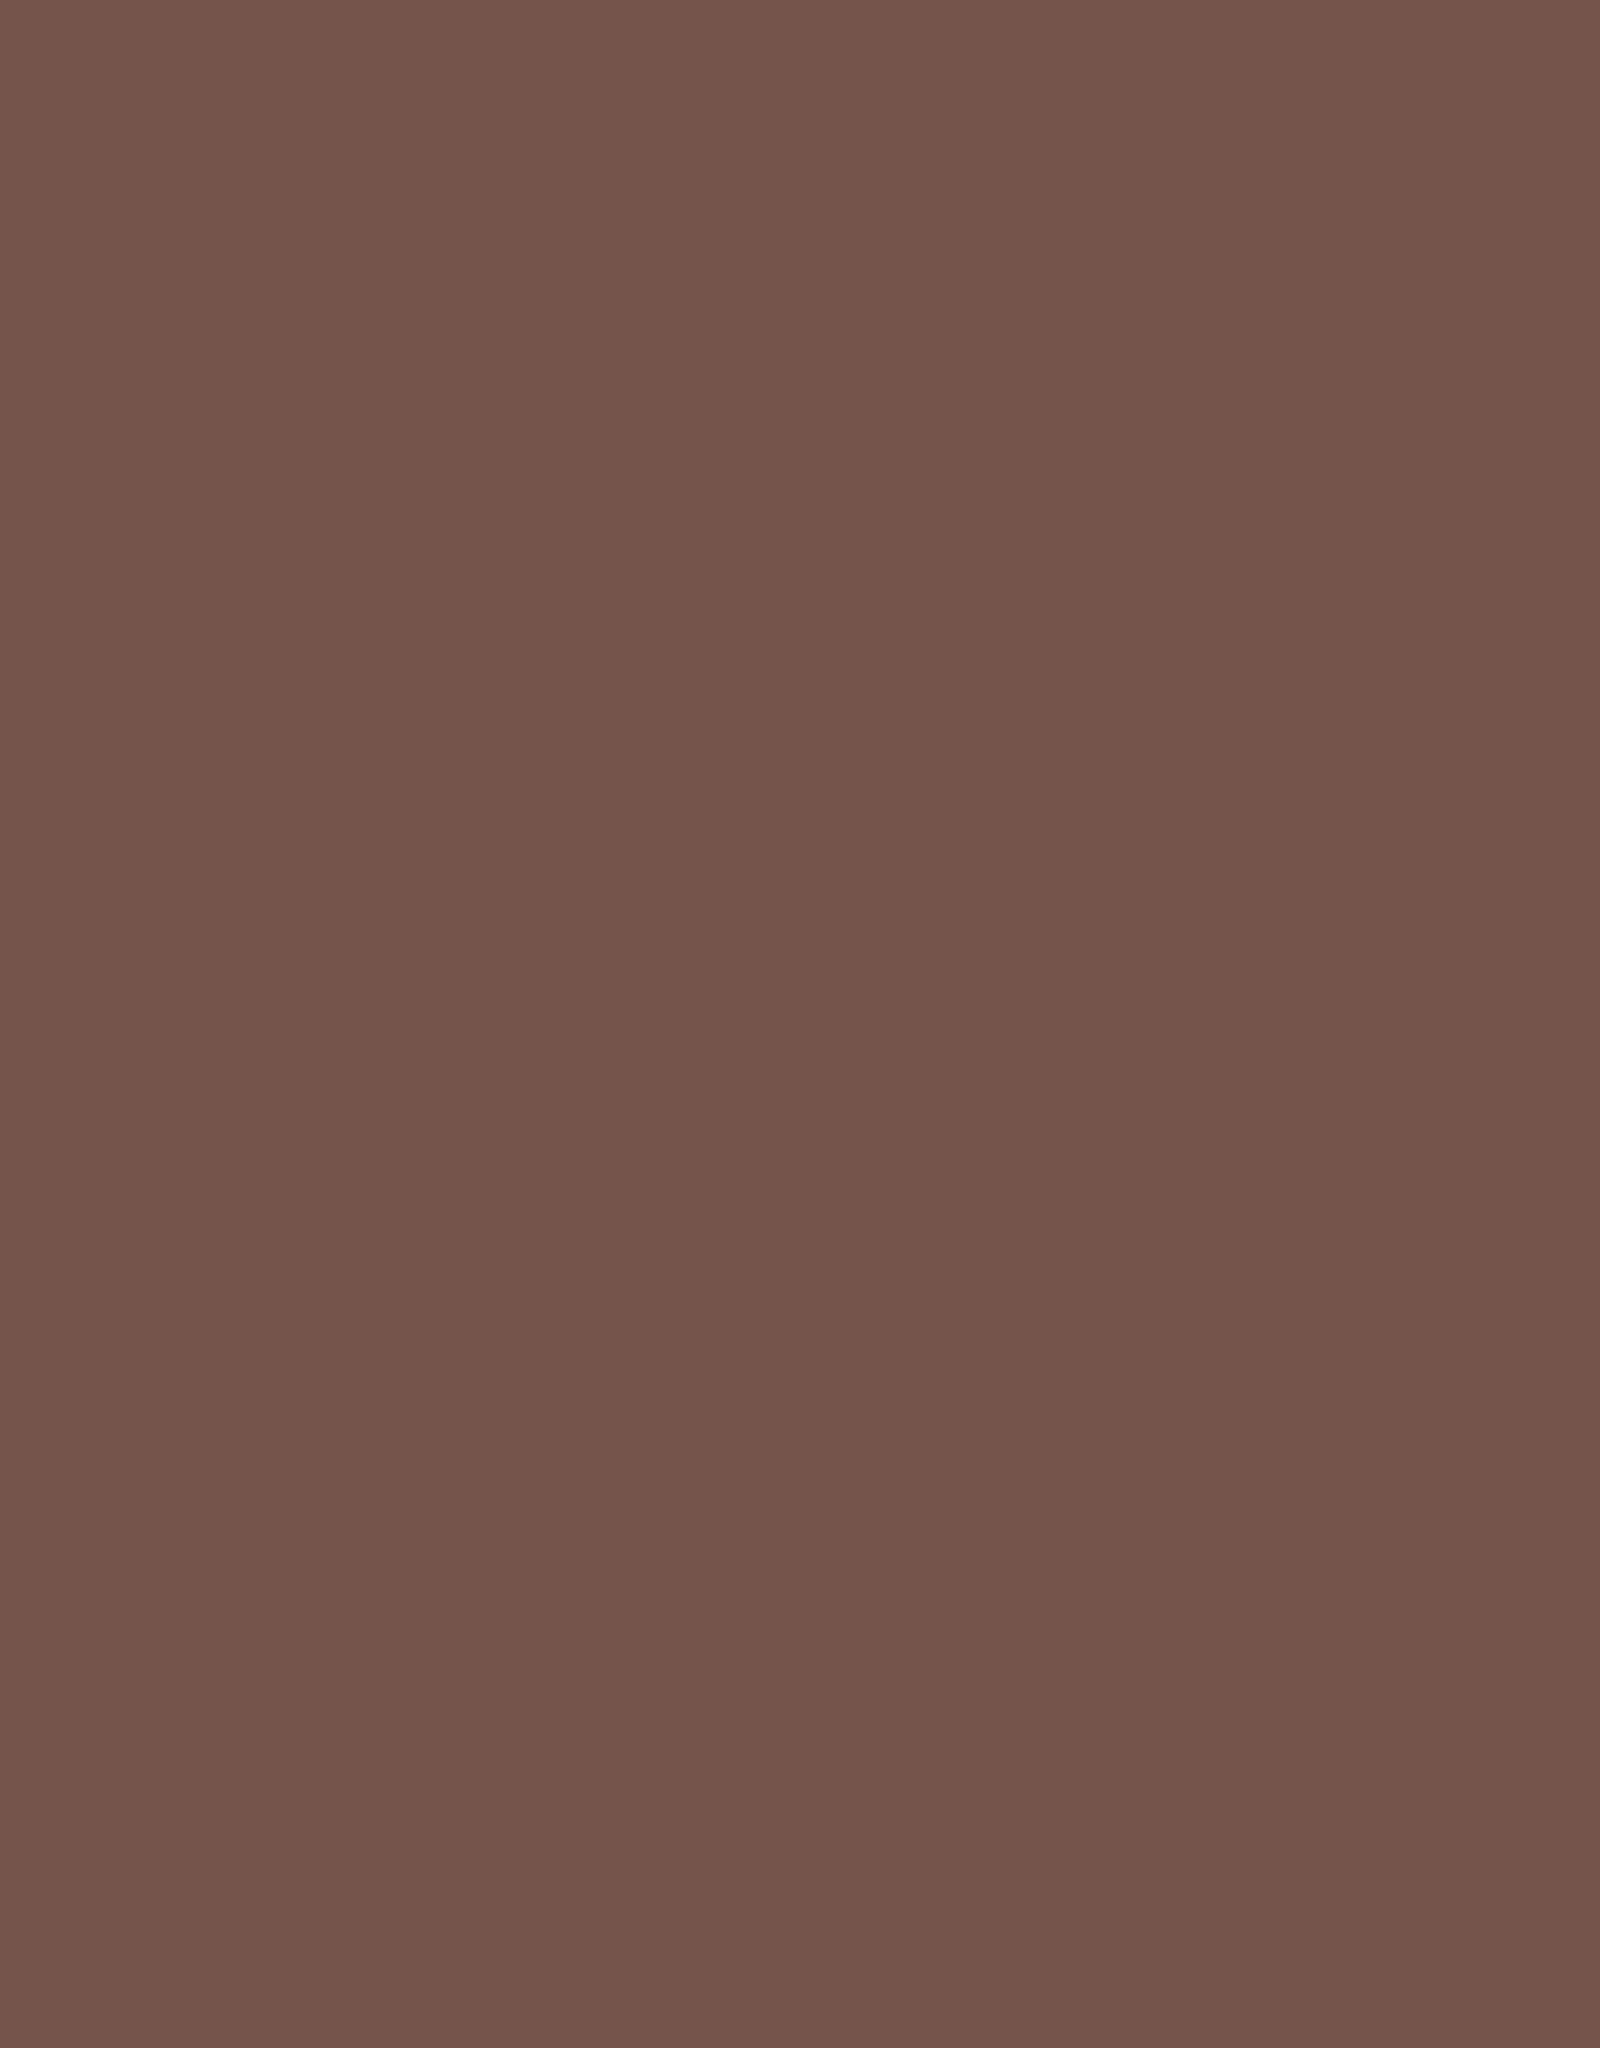 Superior Seamless Superior Seamless 9' Coco Brown #20